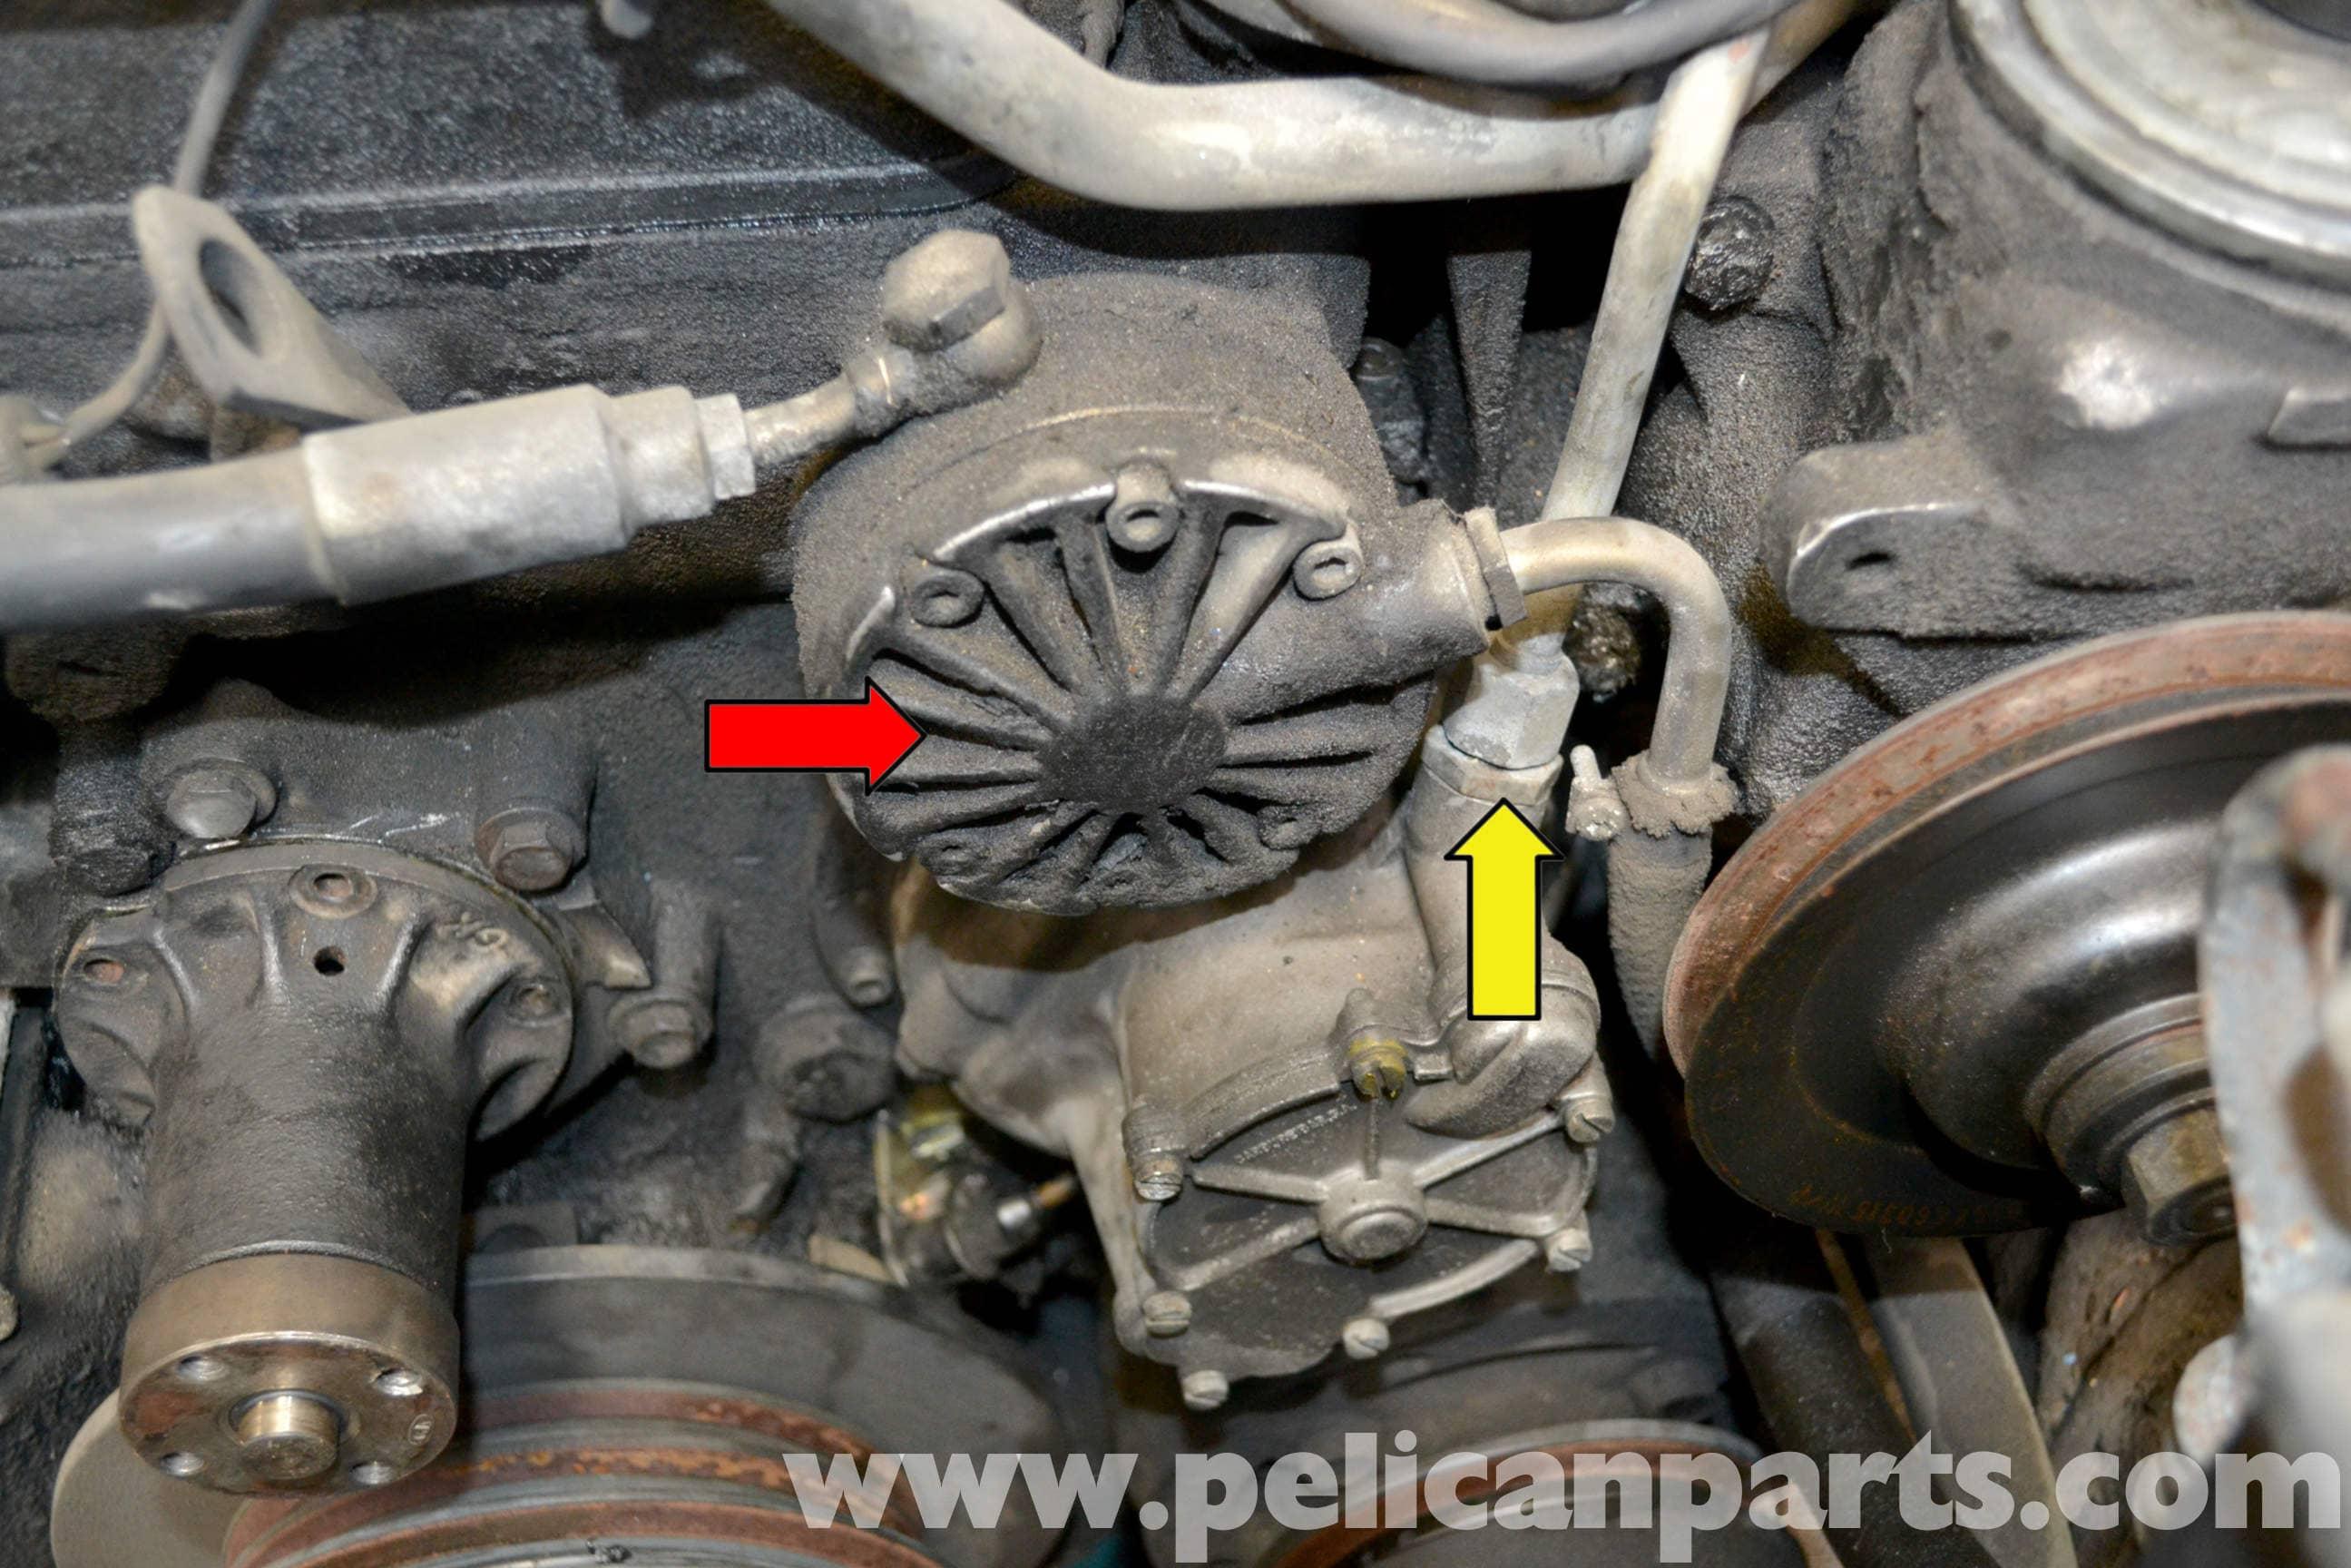 mini cooper suspension diagram rv battery bank wiring mercedes-benz w123 vacuum pump replacement | 300td 1977-1985 pelican parts diy maintenance article